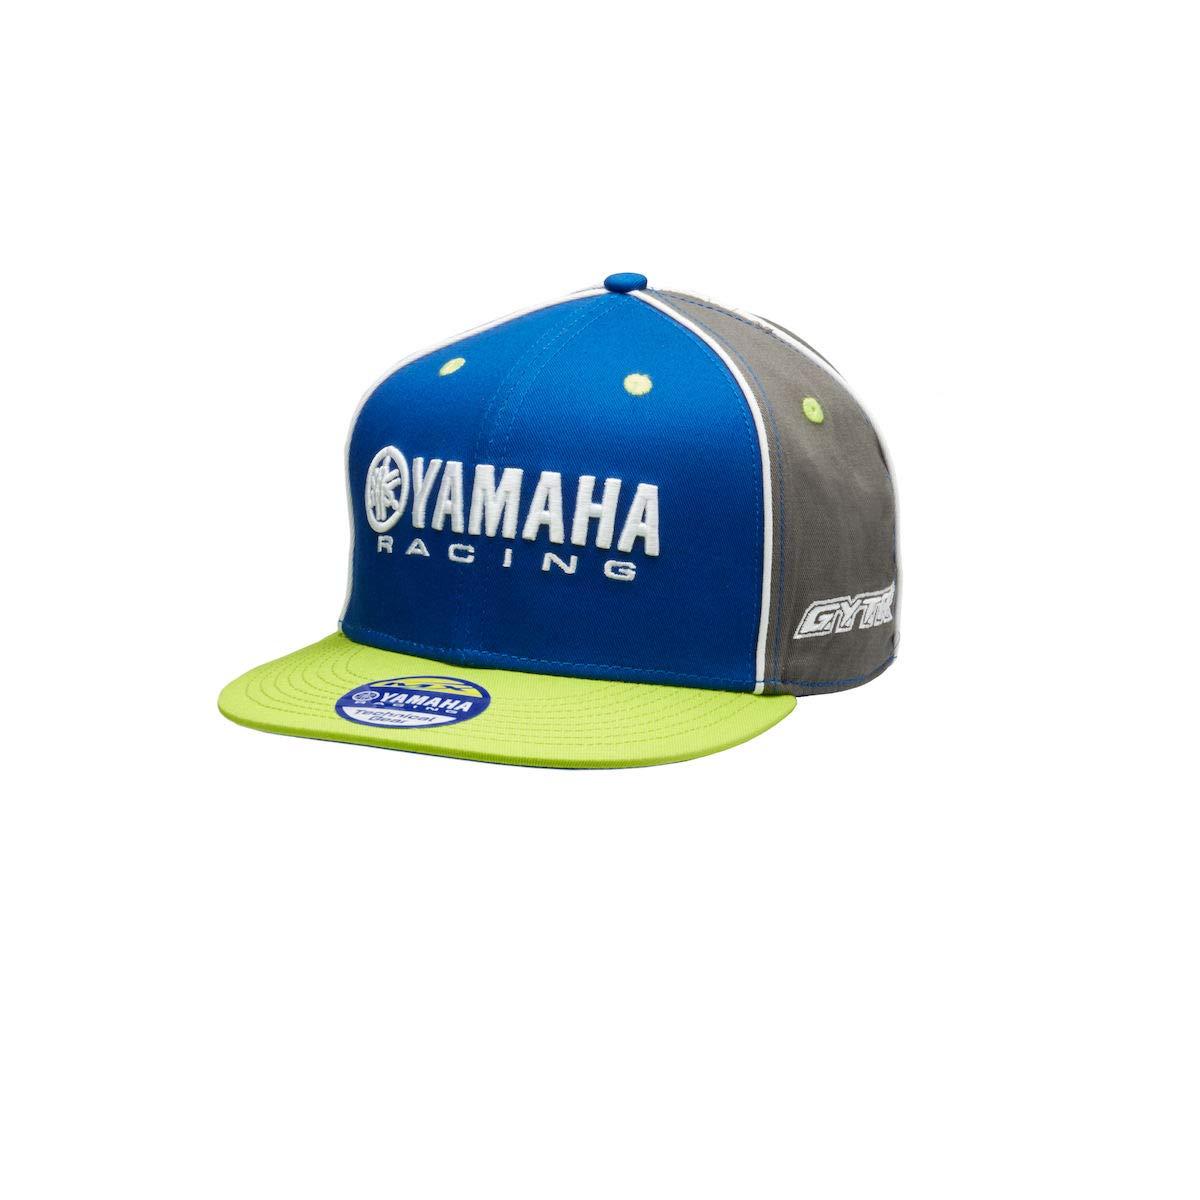 Cappello cappellino Berretto MX Doncast Yamaha racing GYTR motocross paddock ufficiale 100/% cotone regolabile frontino off-road mondiale super cross